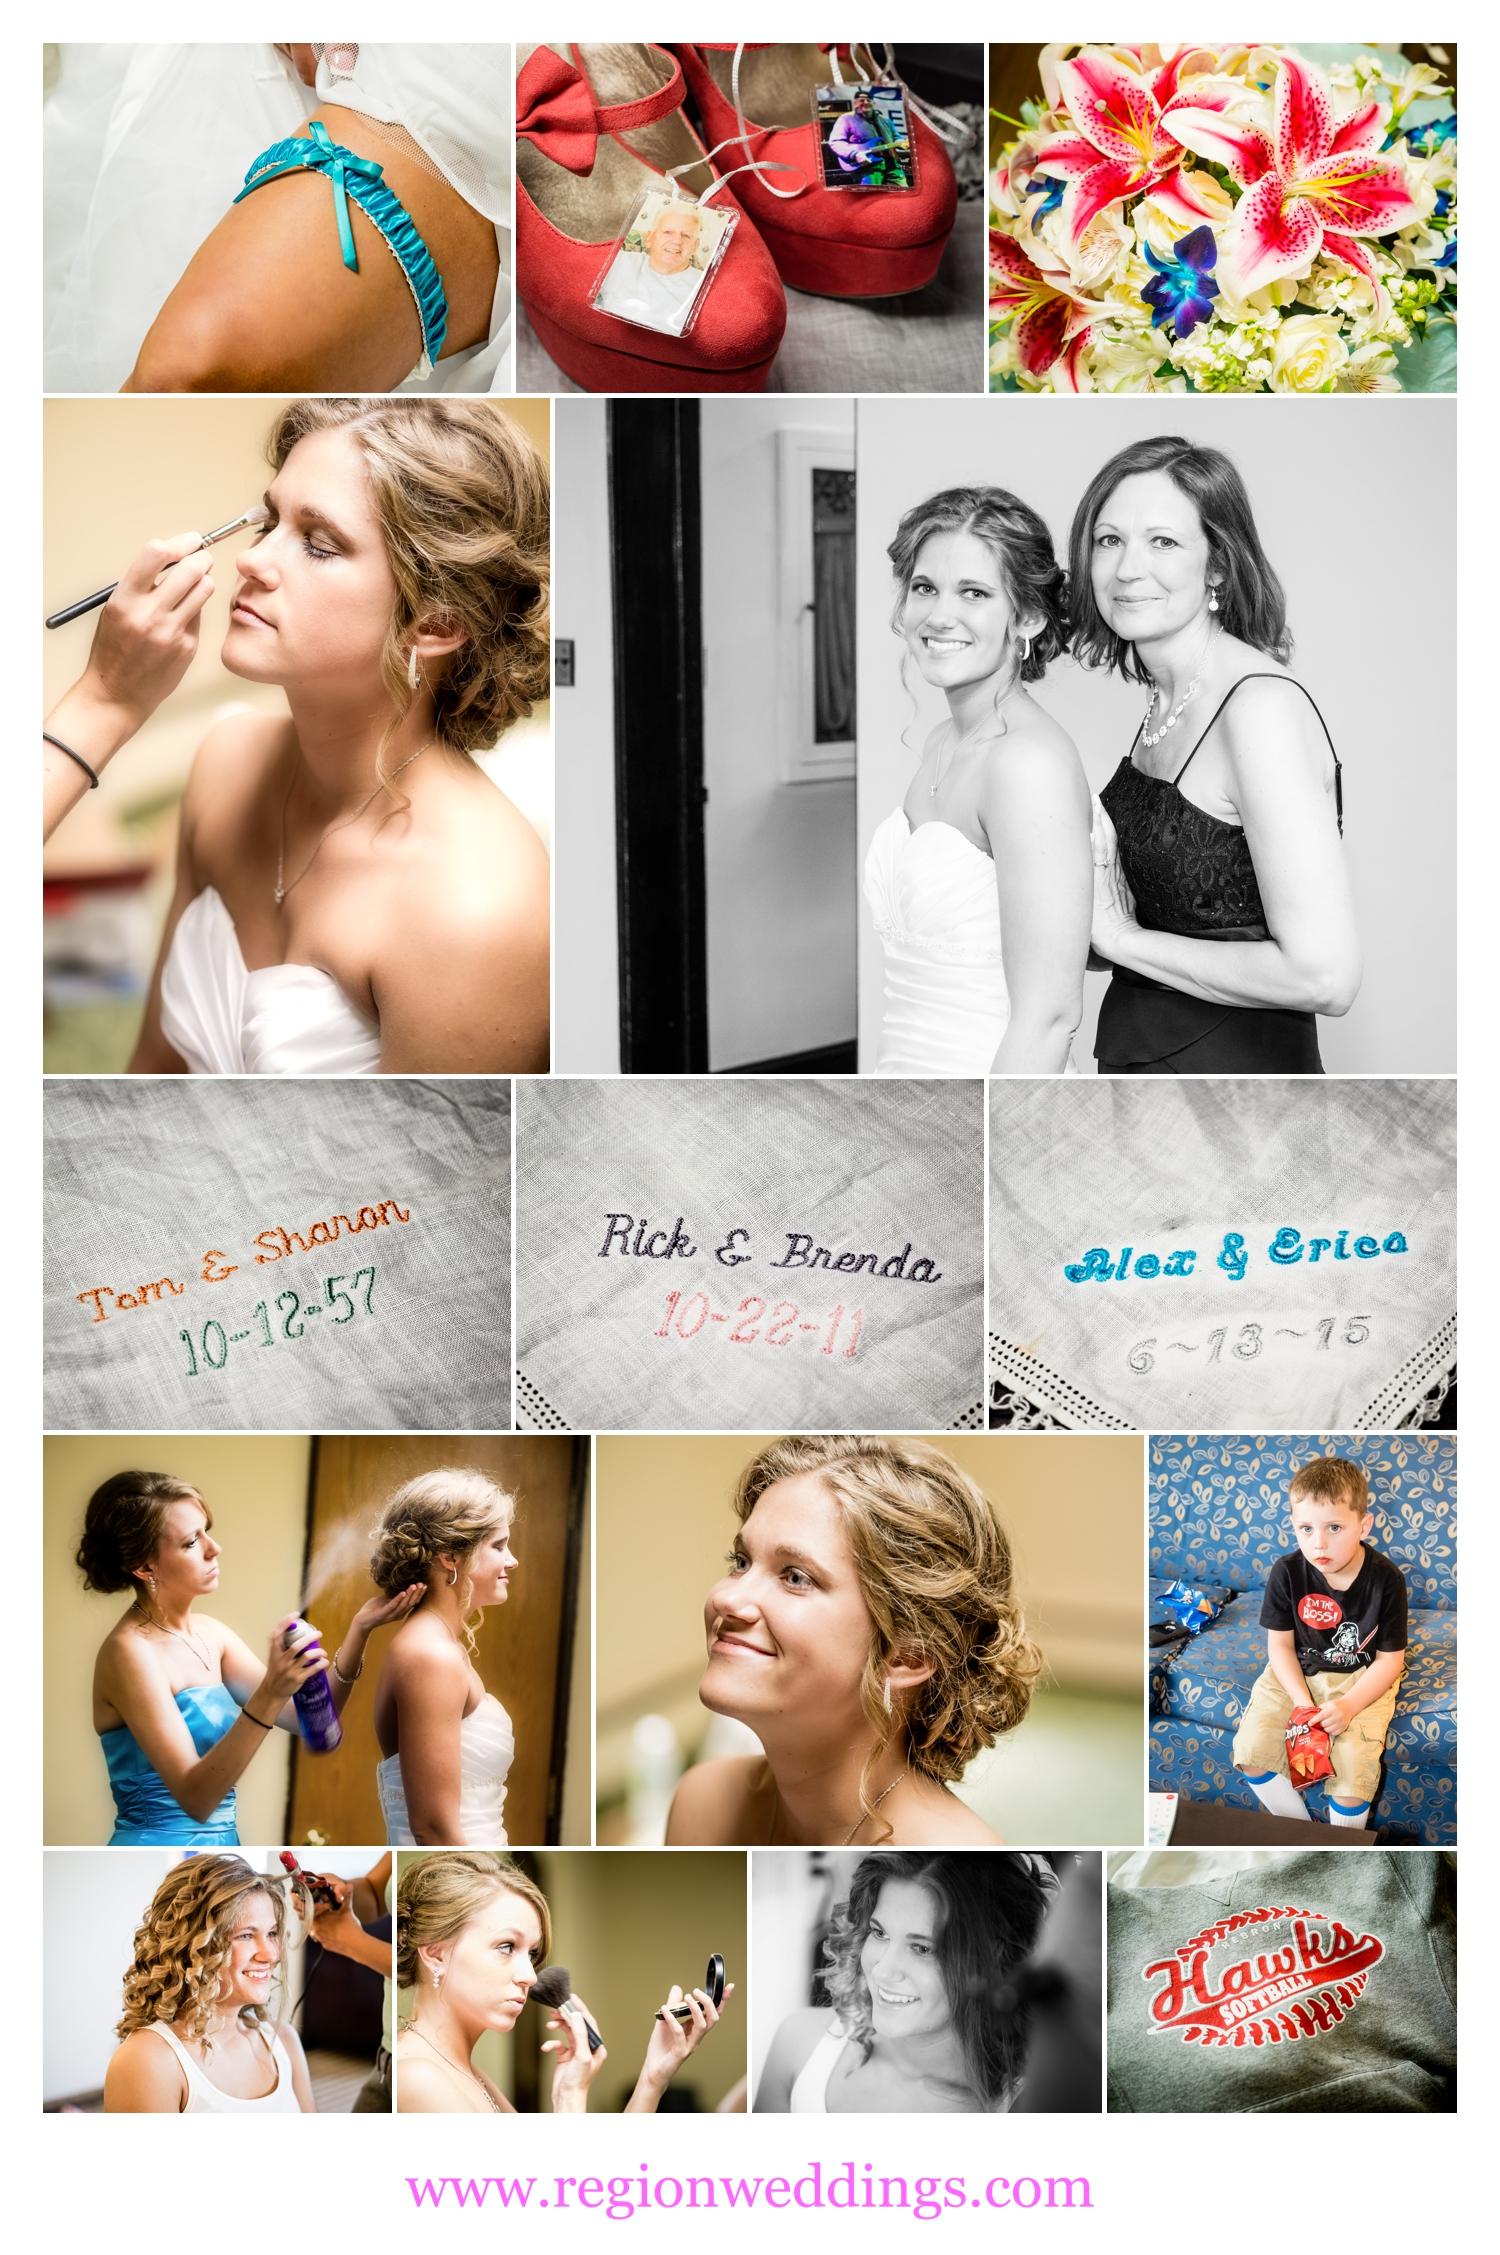 bride-getting-ready-at-church.jpg